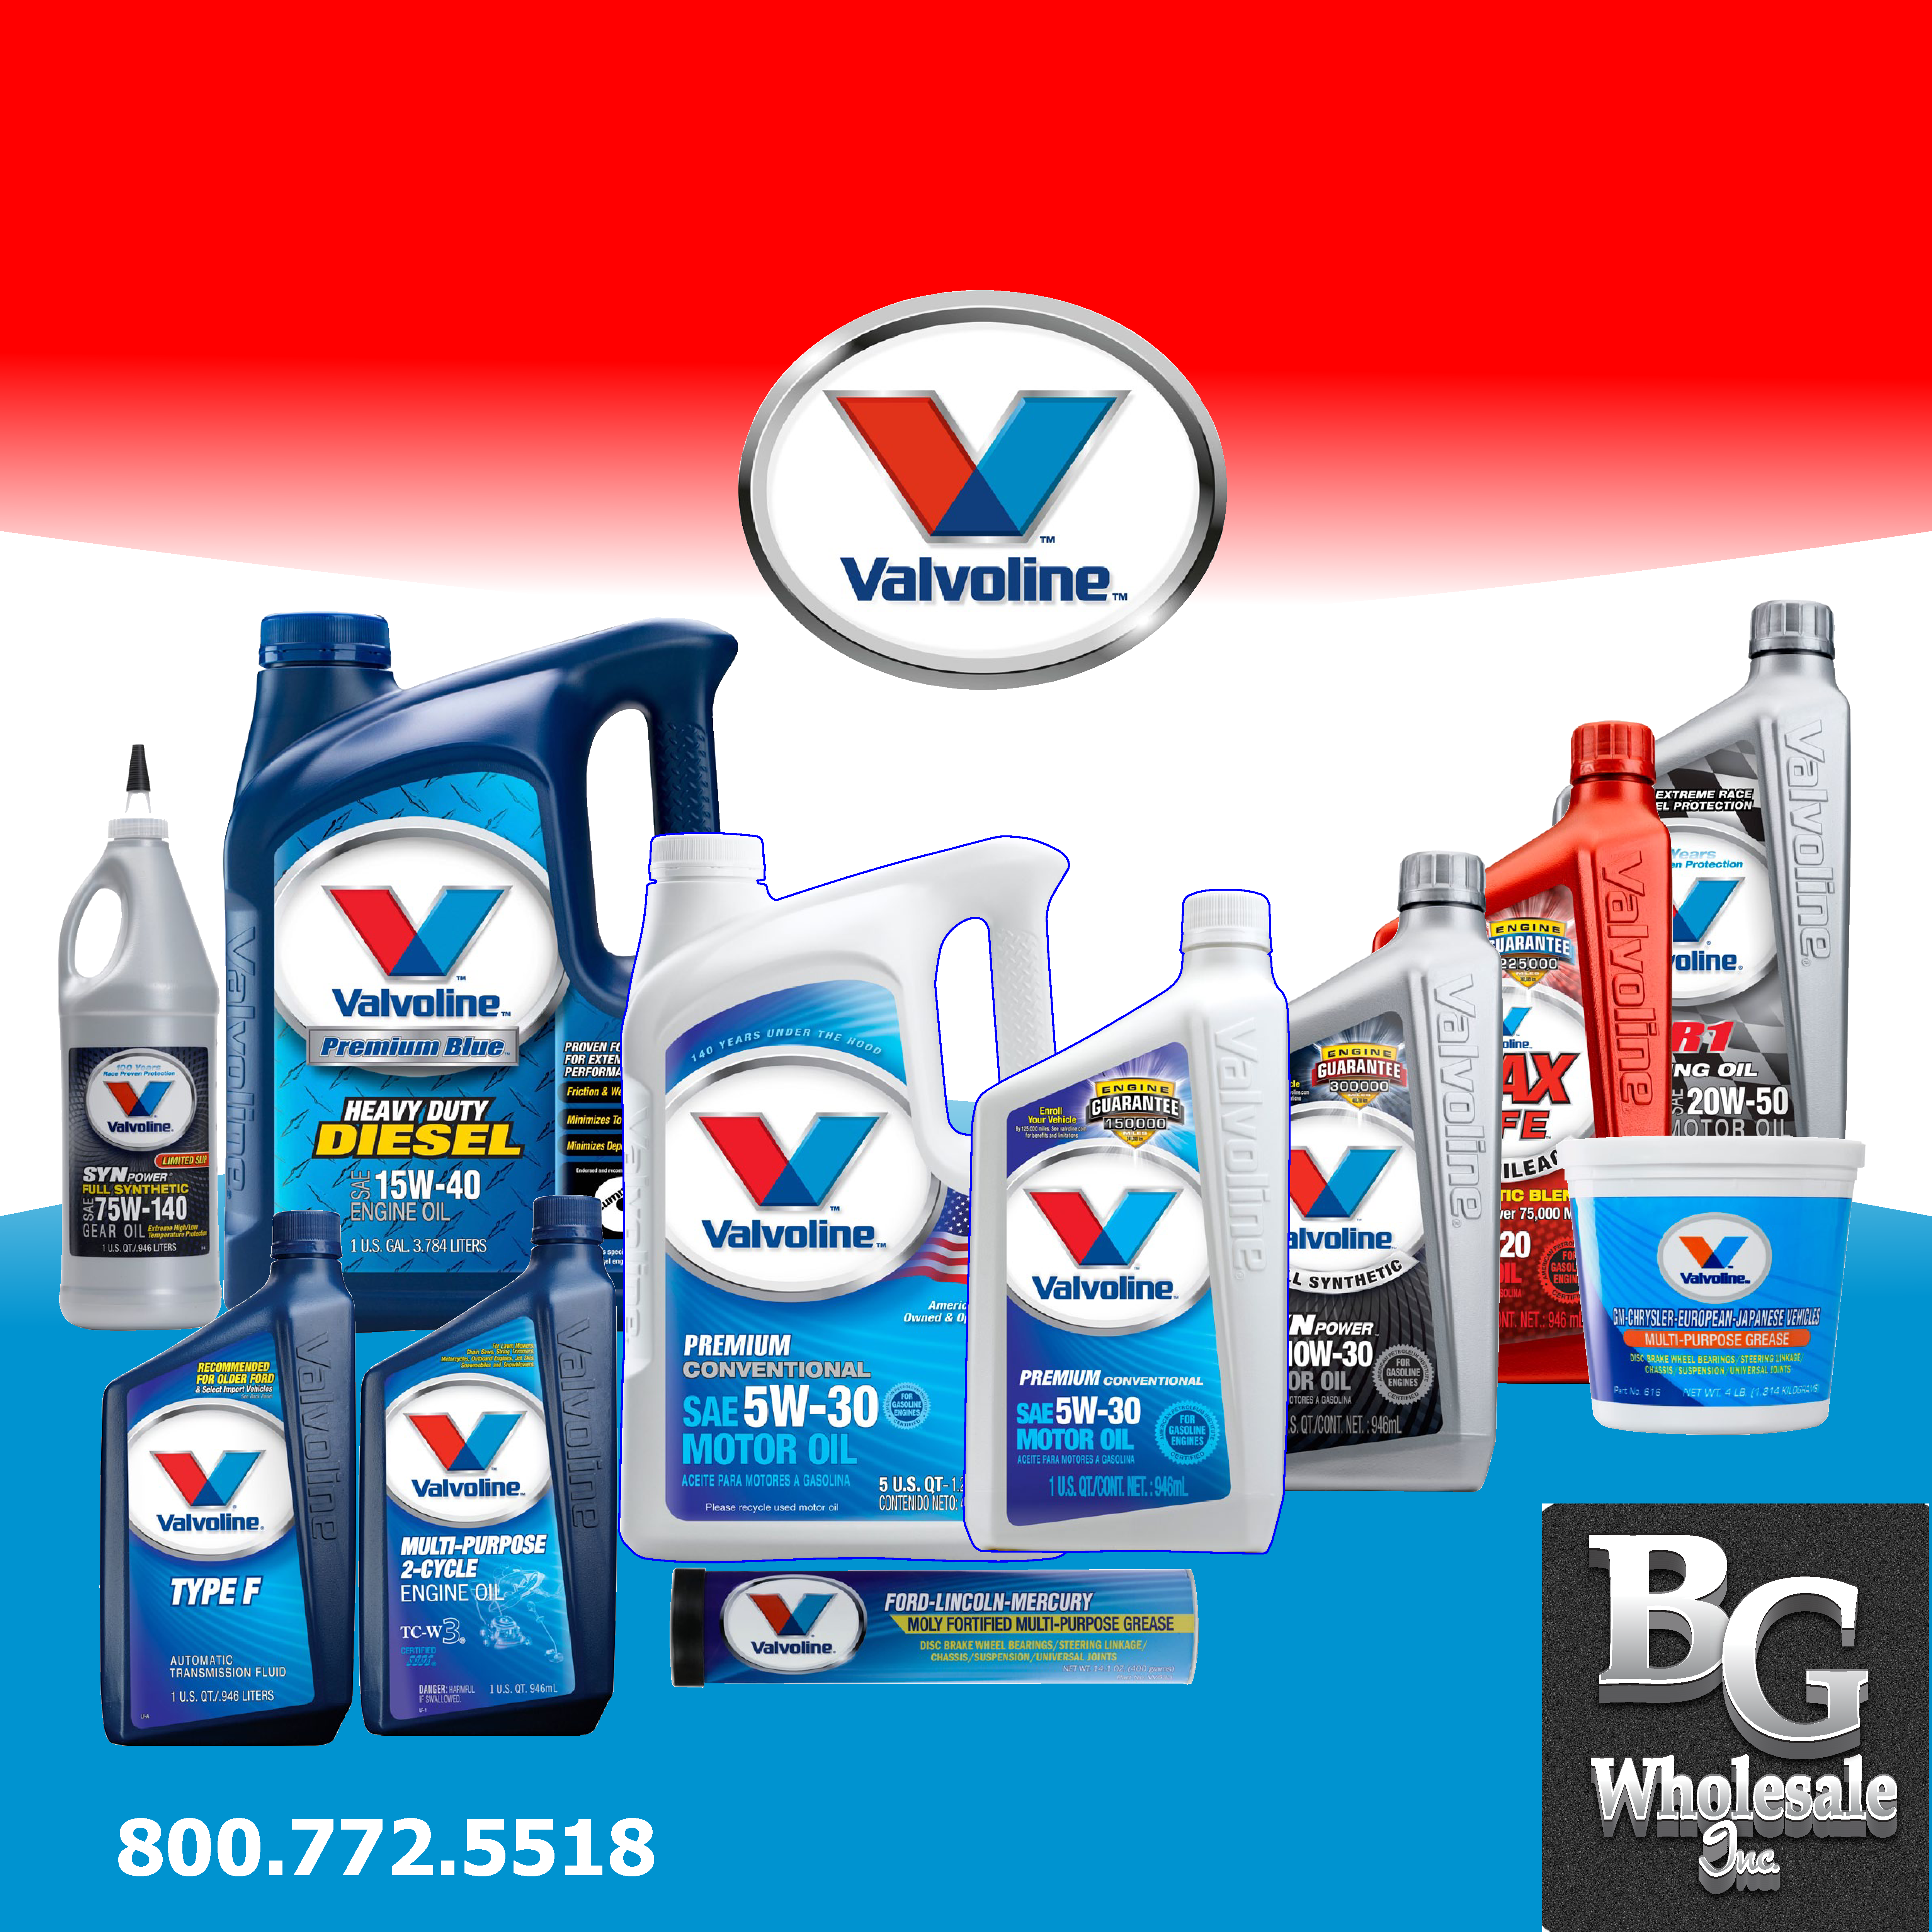 Bg Wholesale Inc Offers Valvoline Premium Motor Oil Synpower Synthetic Oil Maxlife Racing 2 Cycle Atf And Mu Synthetic Oil Motor Oil Car Mechanic